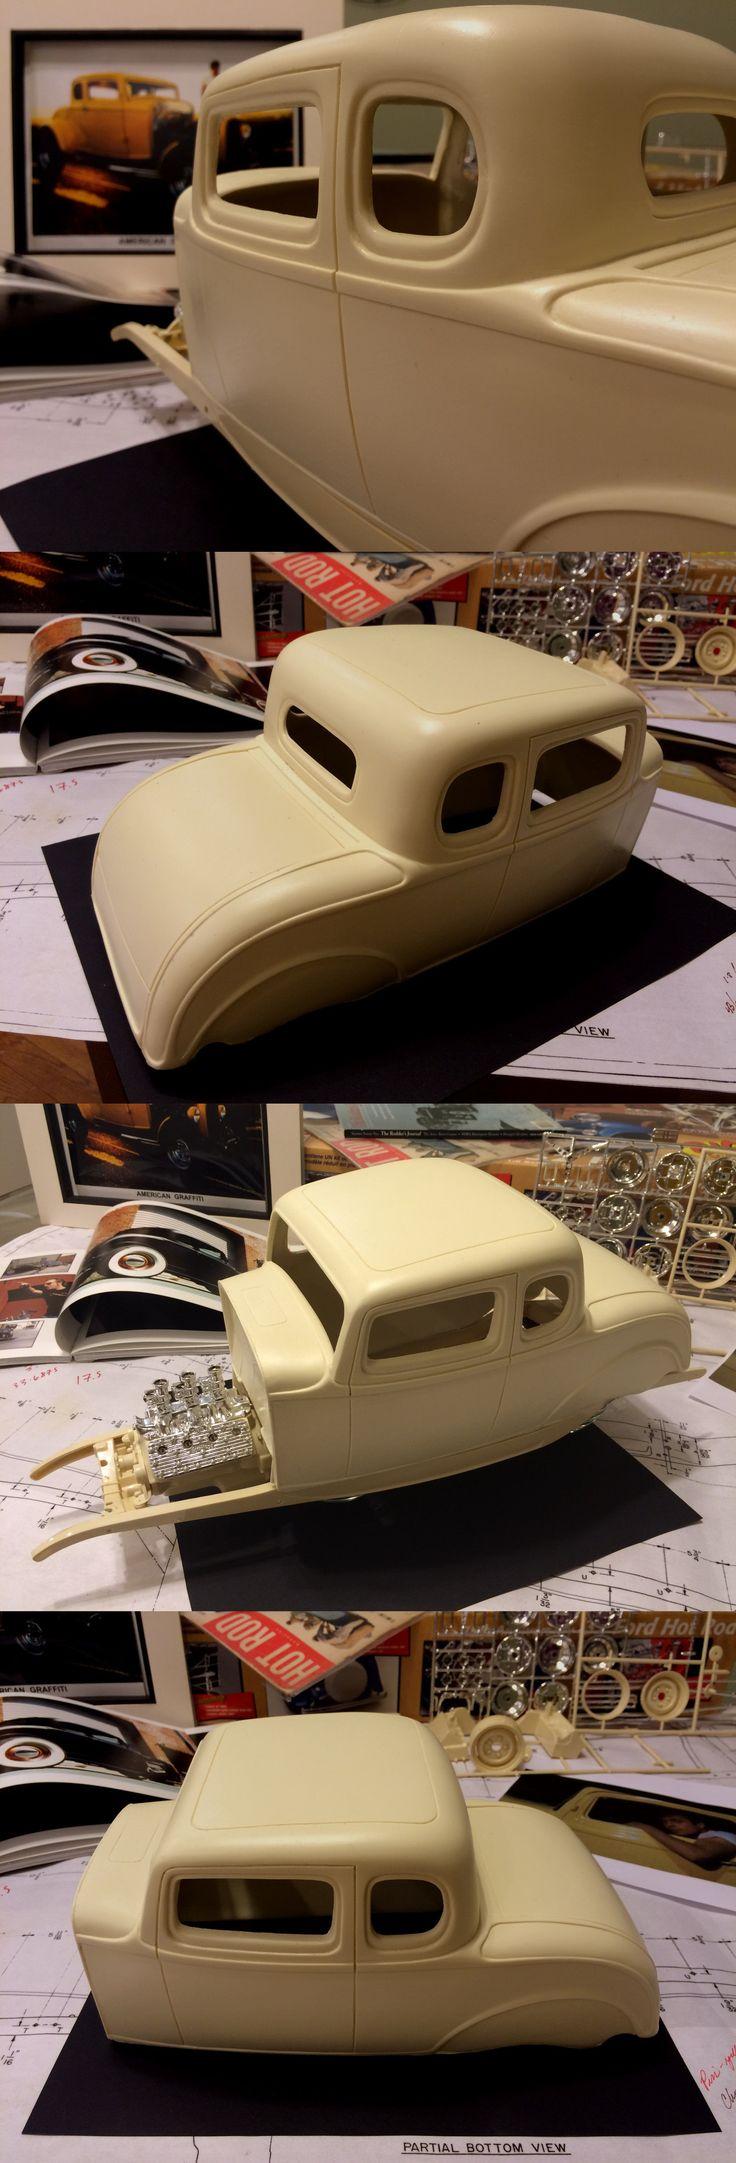 Hot rod 2582 new 1 8 scale chopped 1932 ford 5 window body big deuce